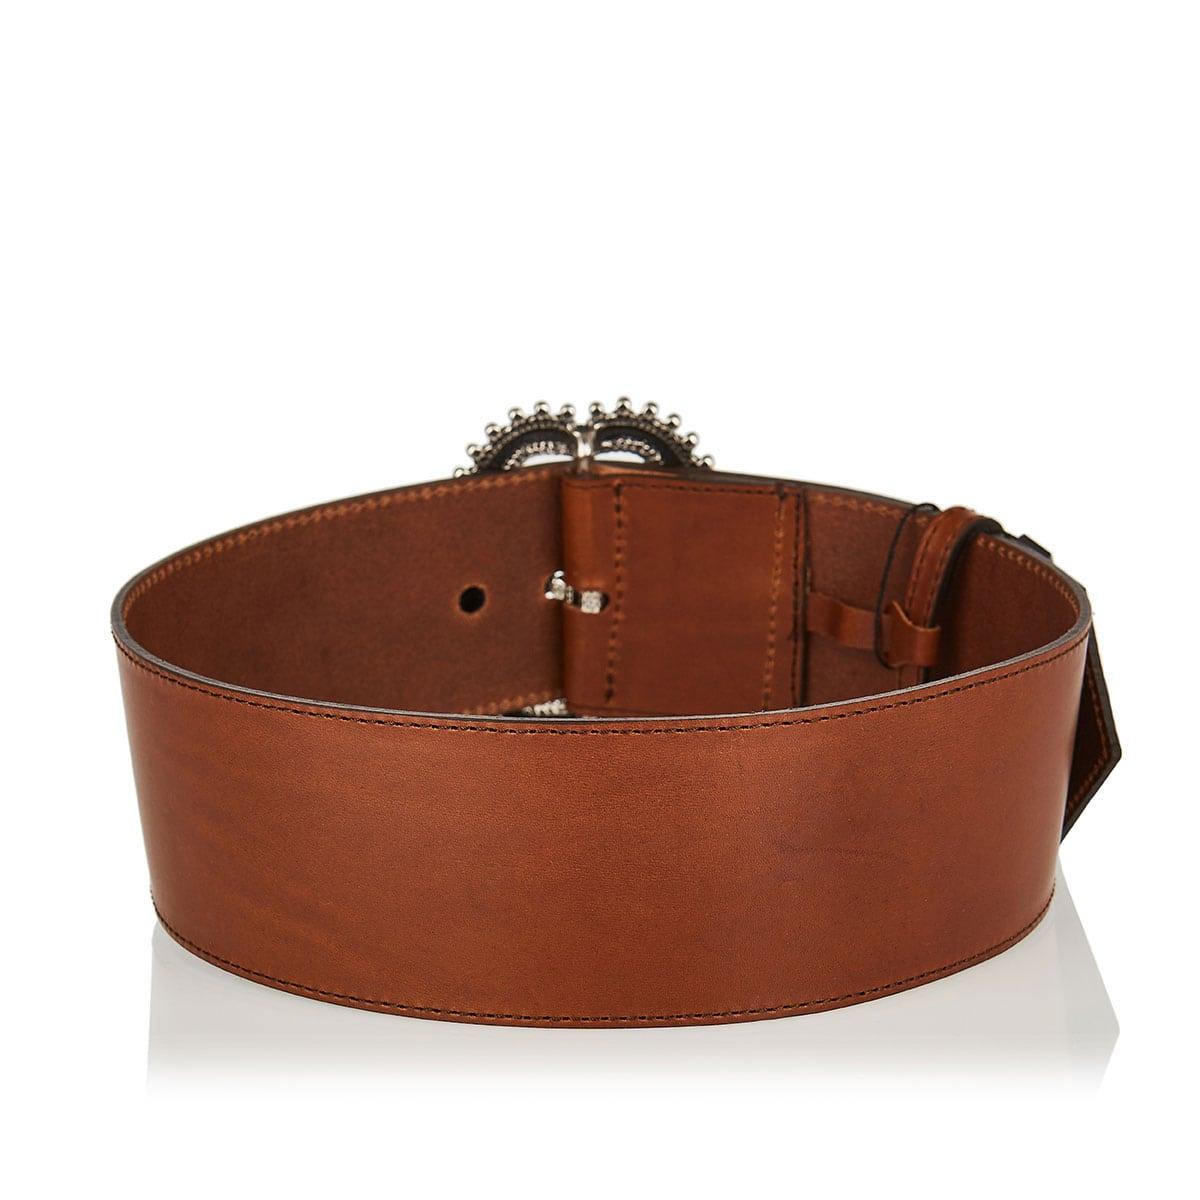 Jeweled-buckle wide belt